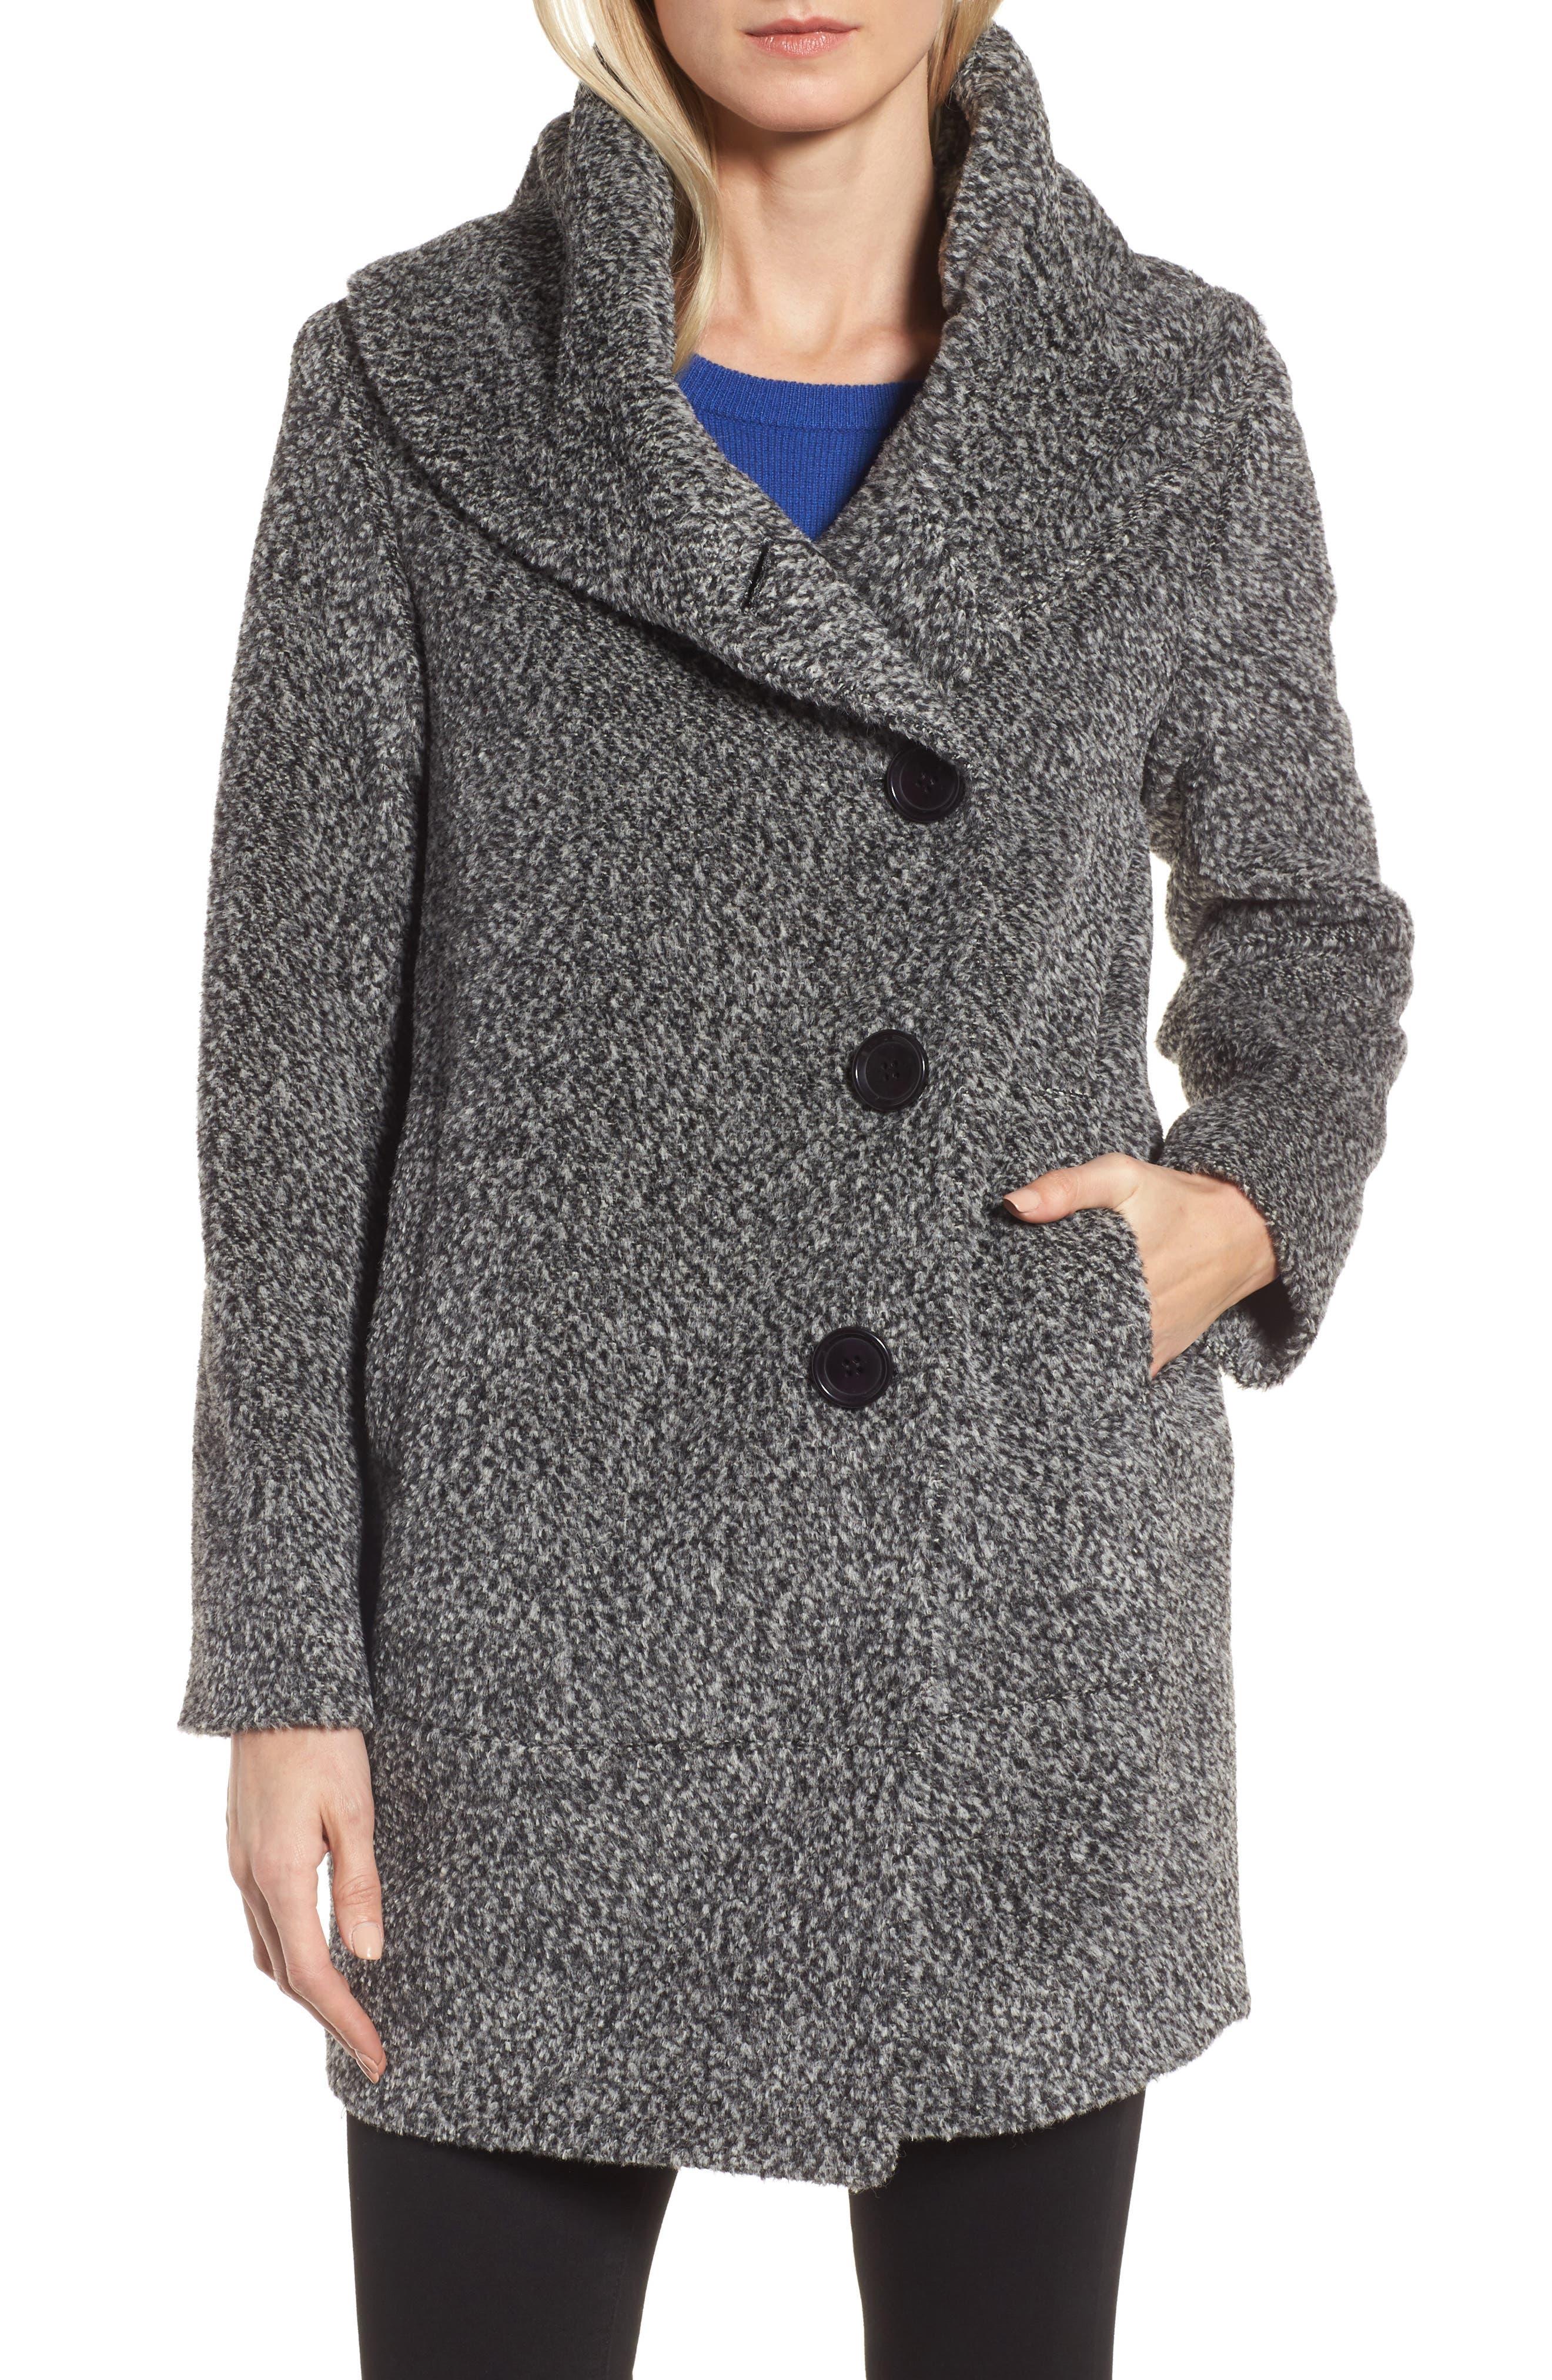 Wool Blend Coat,                             Main thumbnail 1, color,                             011